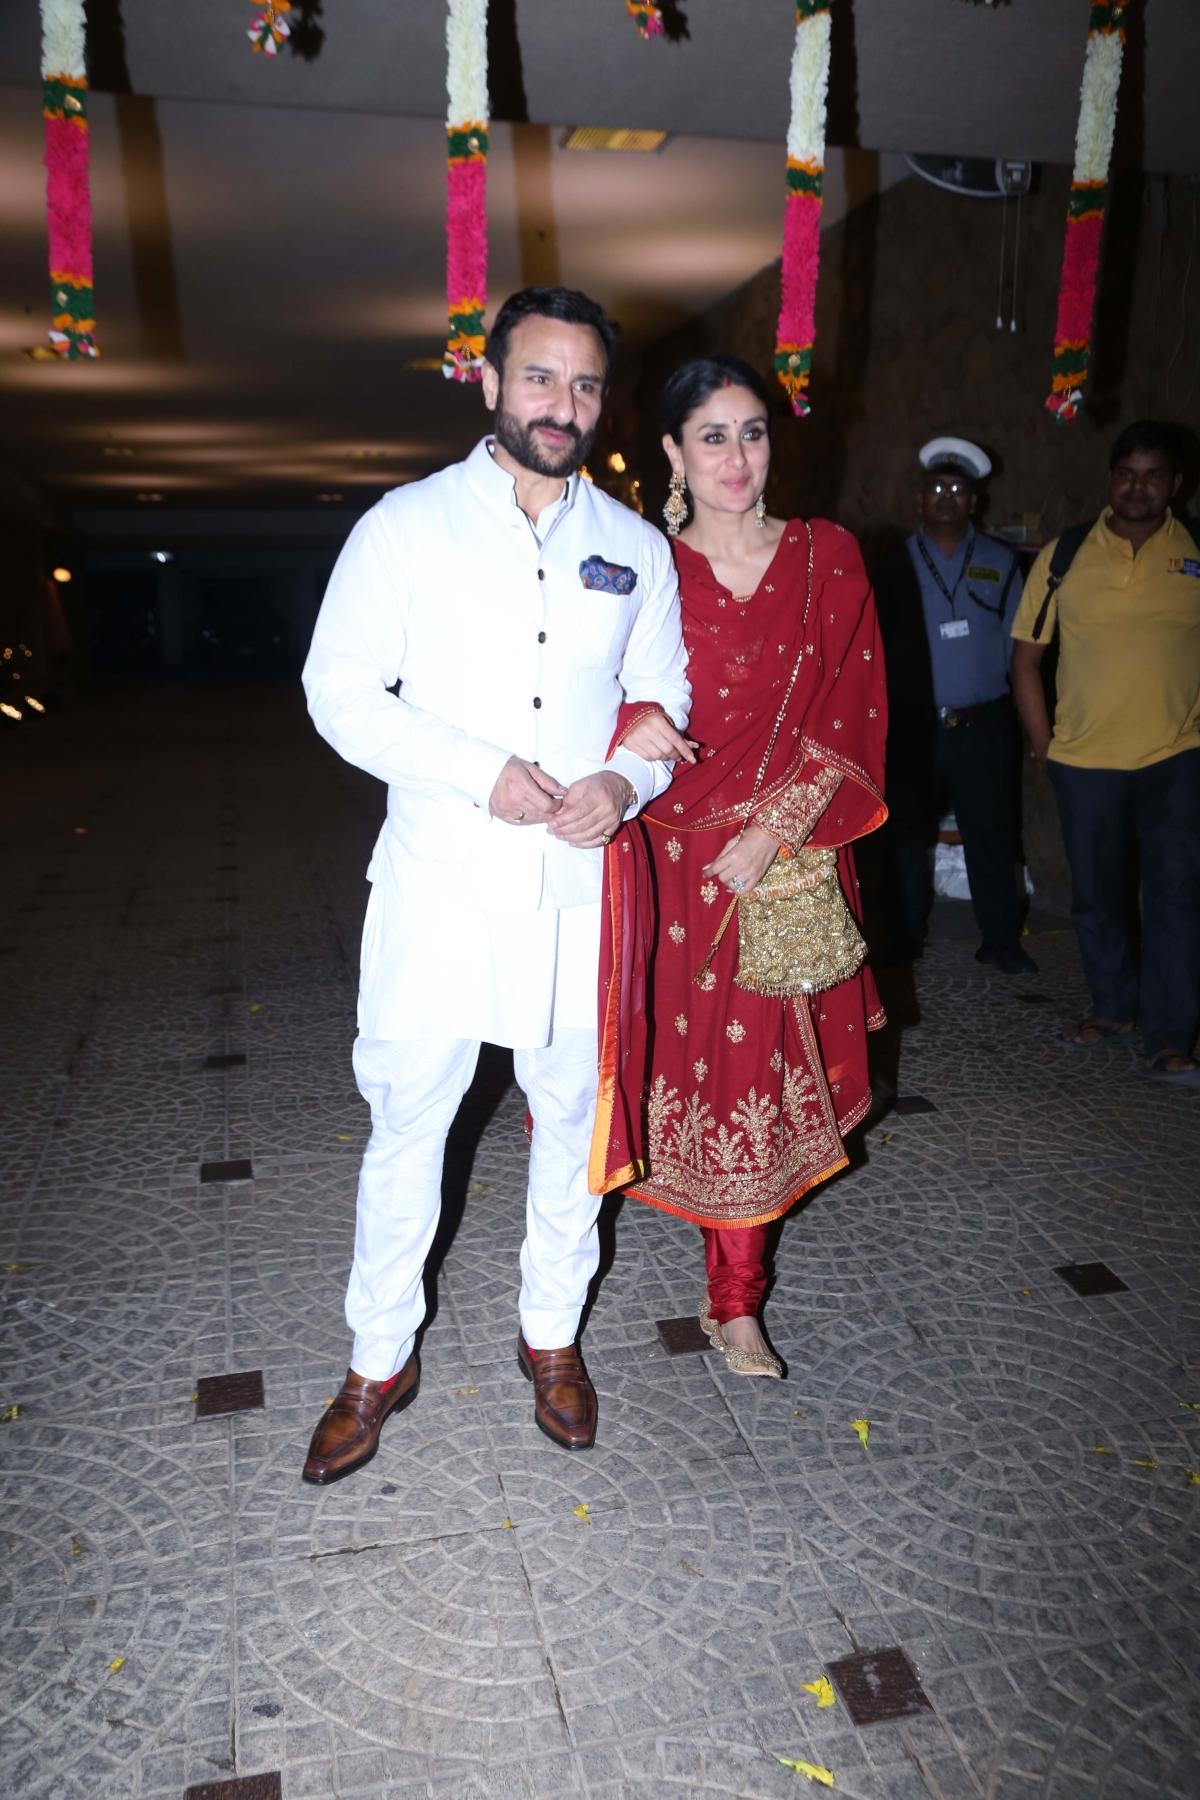 Saif Ali Khan and Kareena Kapoor Khan